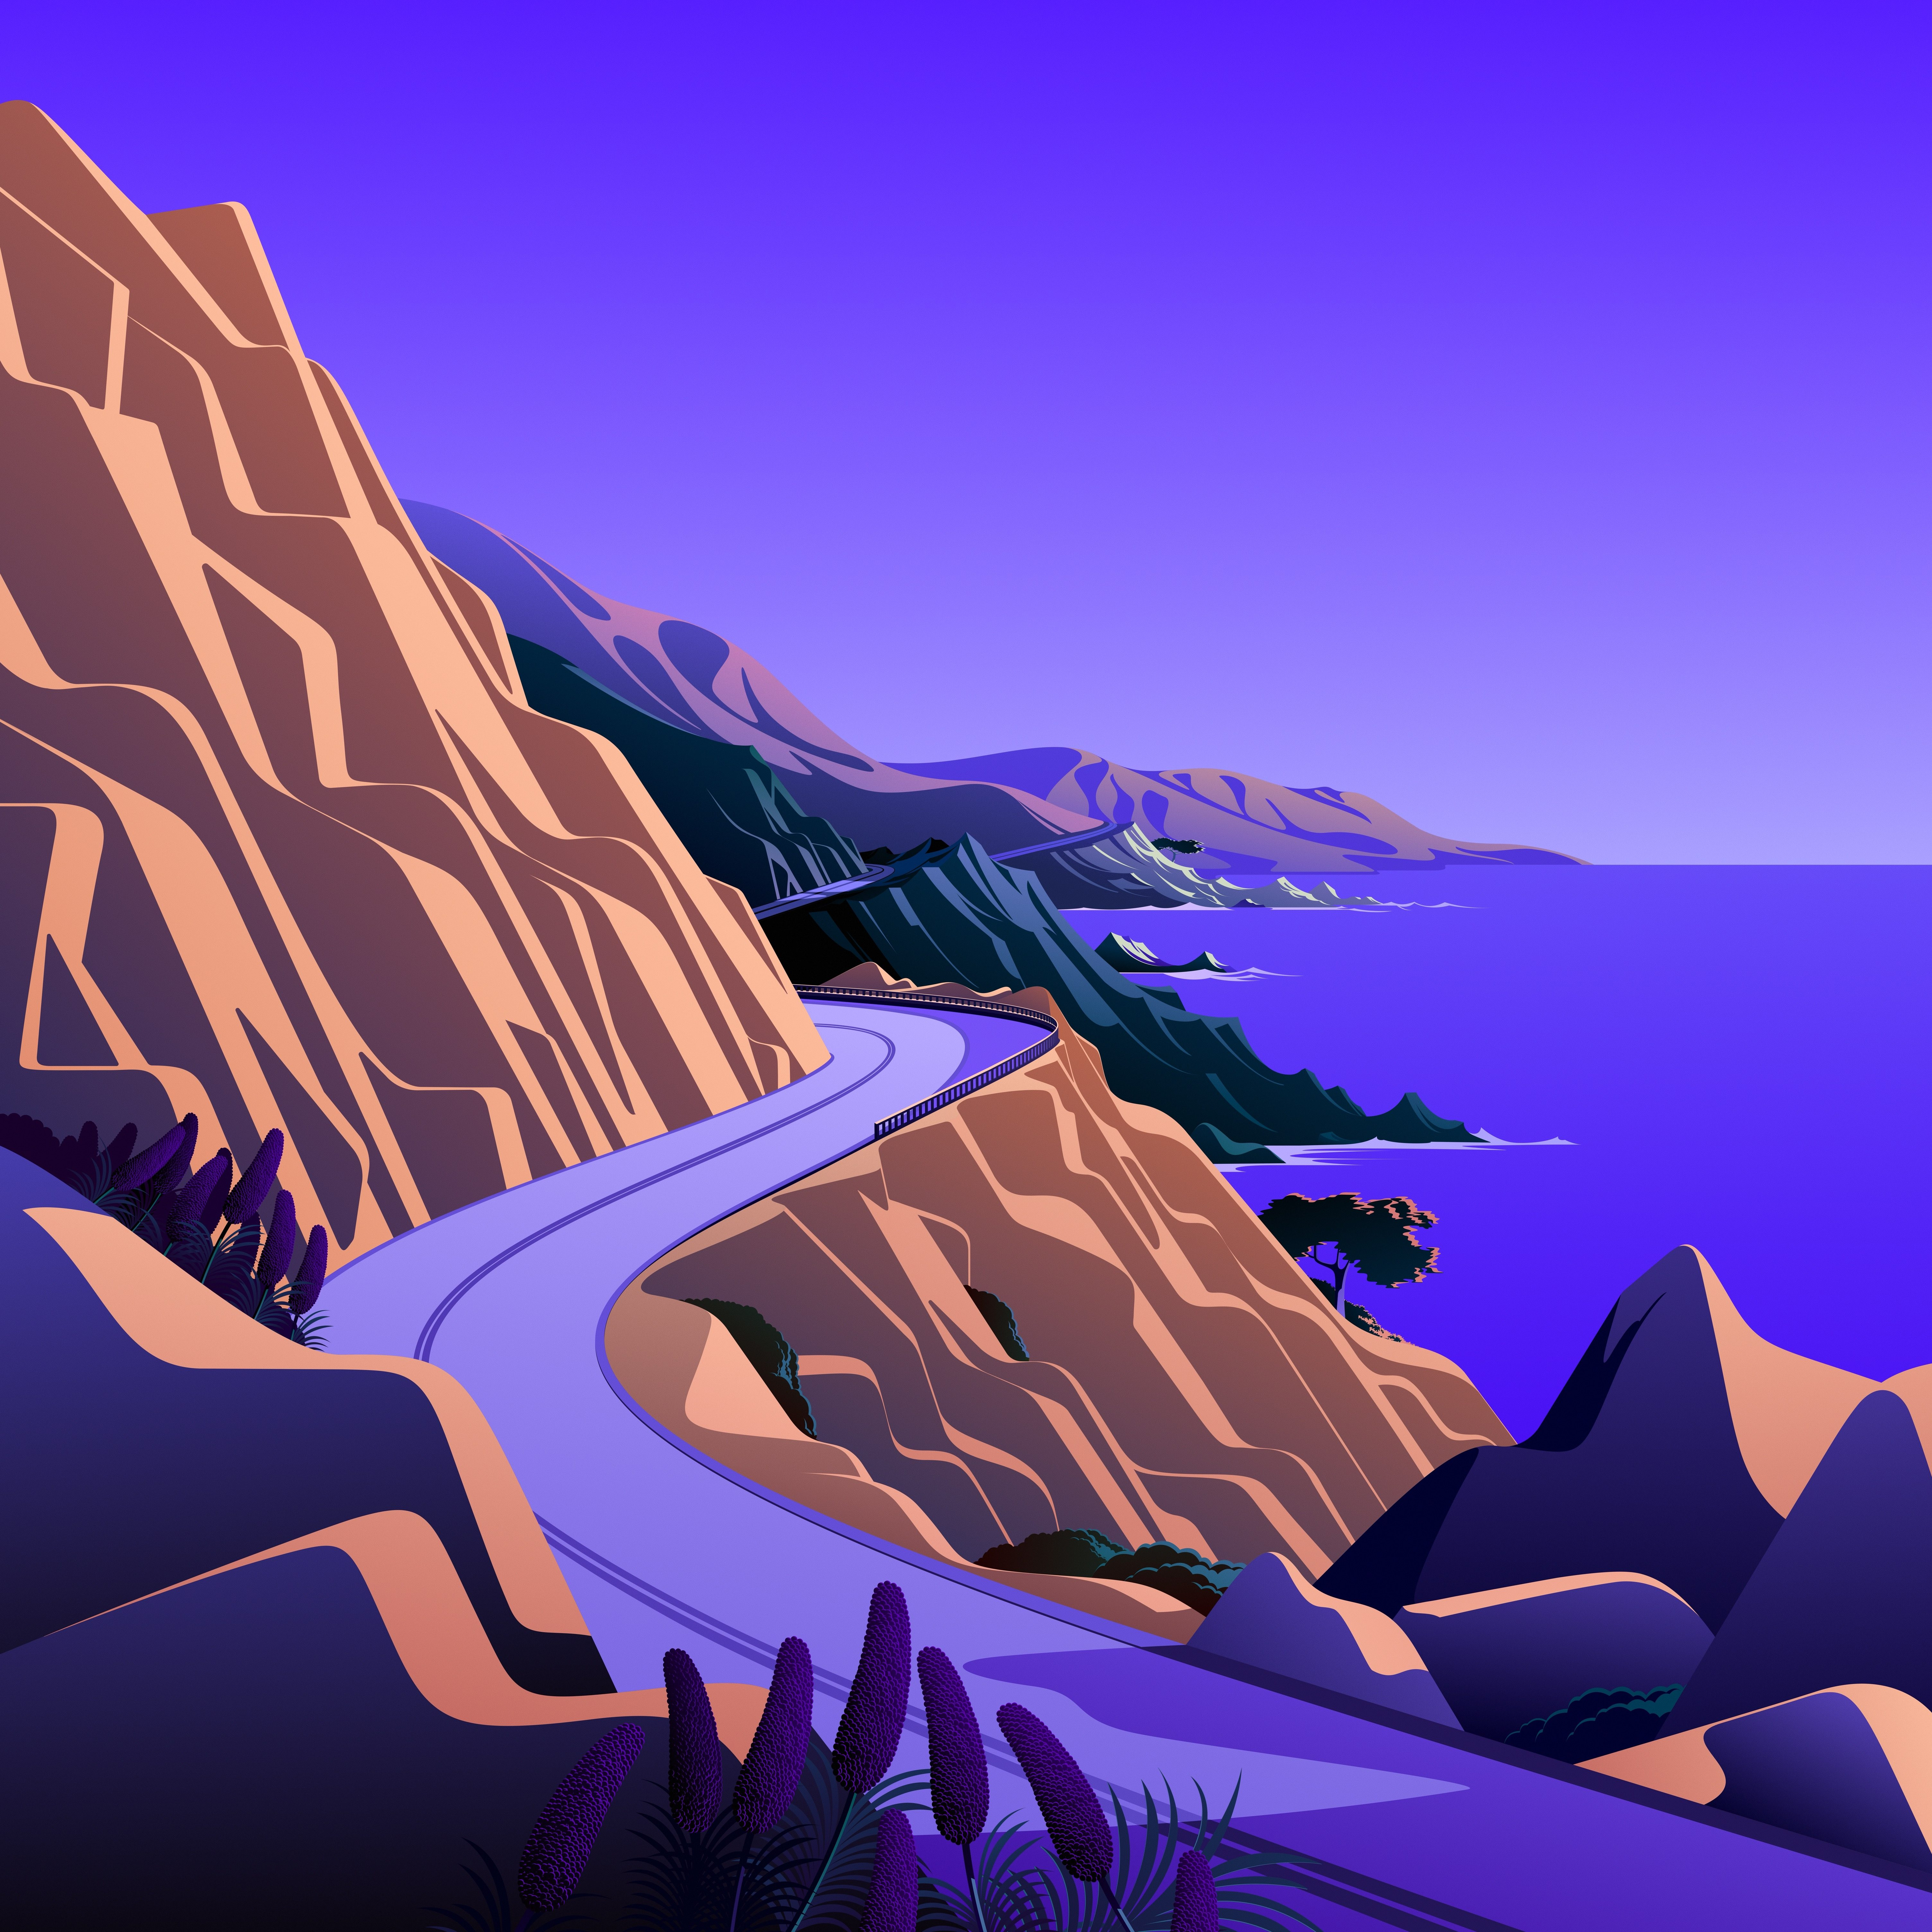 macOS Big Sur The Cliffs 6 dragged